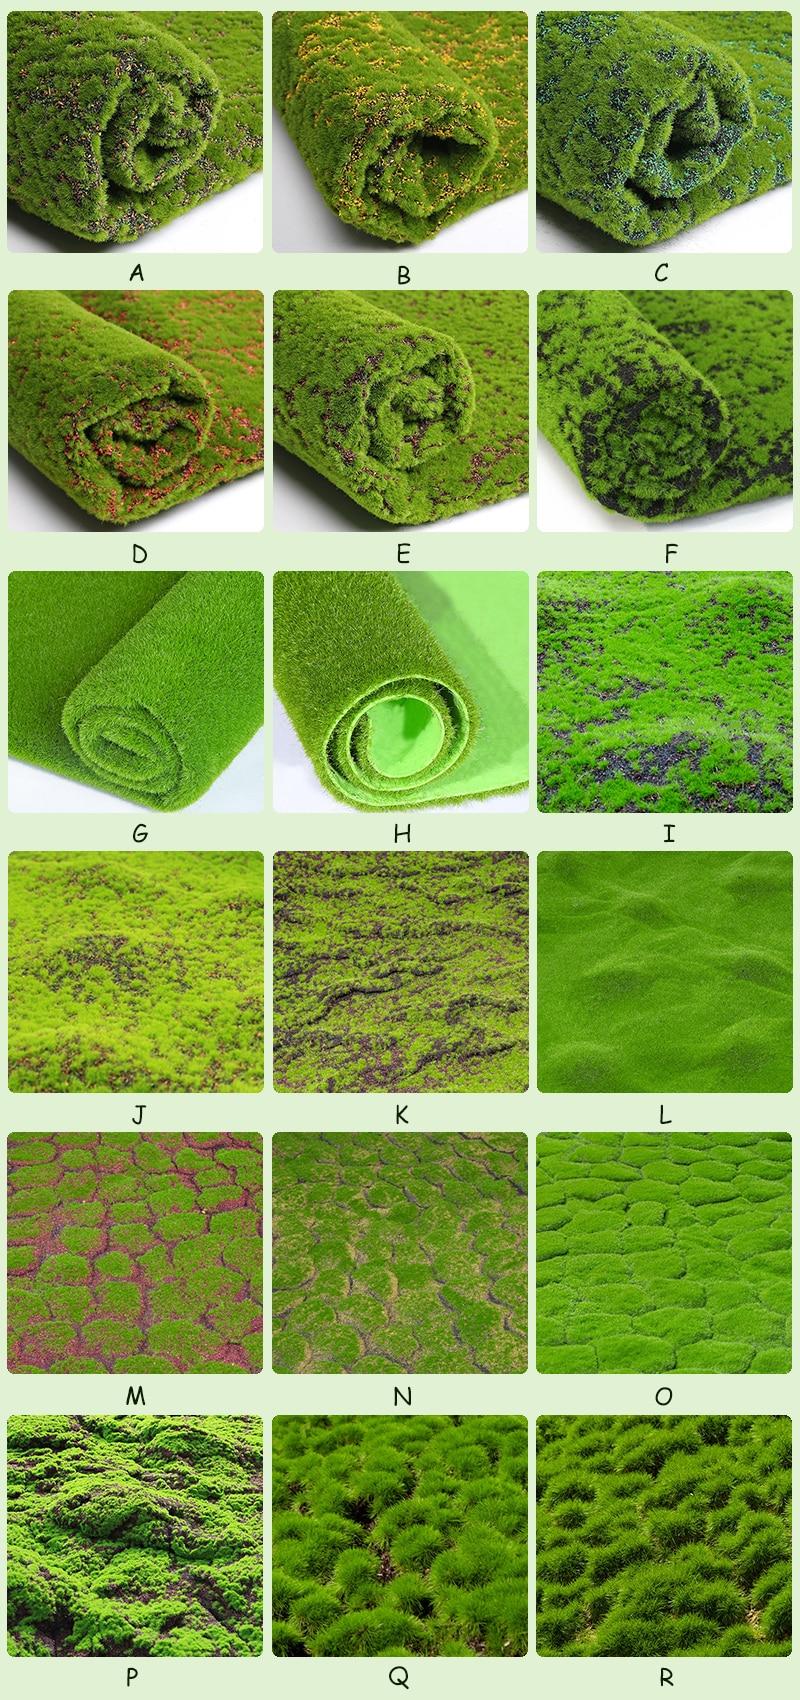 JAROWN Artificial Green Plant Wall Fake Moss Turf Wedding Scenes Decor Mall Window Landscaping Fake Lawn Home Garden Decoration (01)